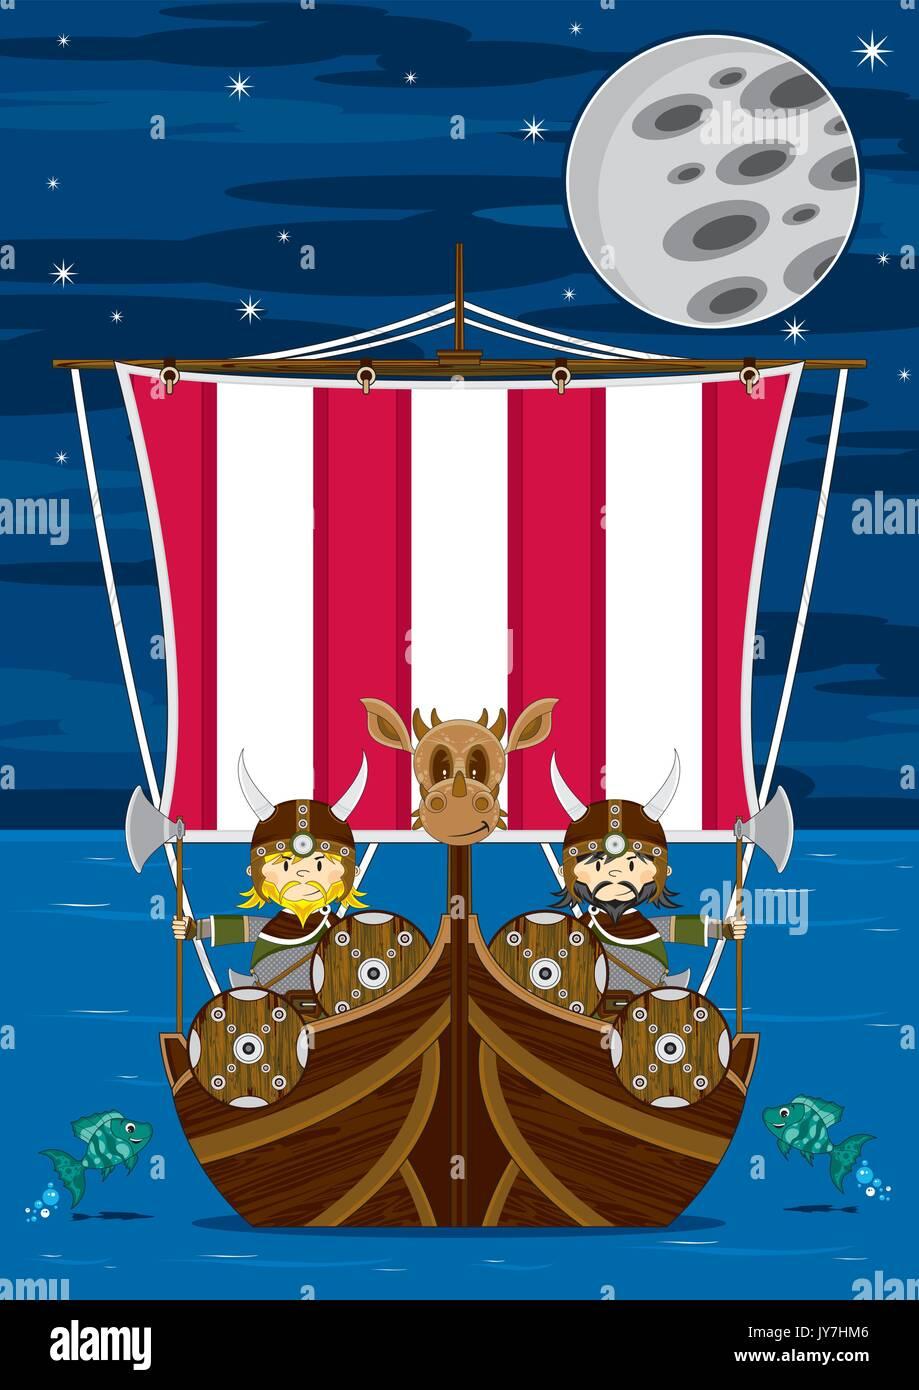 Cartoon Norse Viking Warriors and Longship Vector Illustration Stock ...